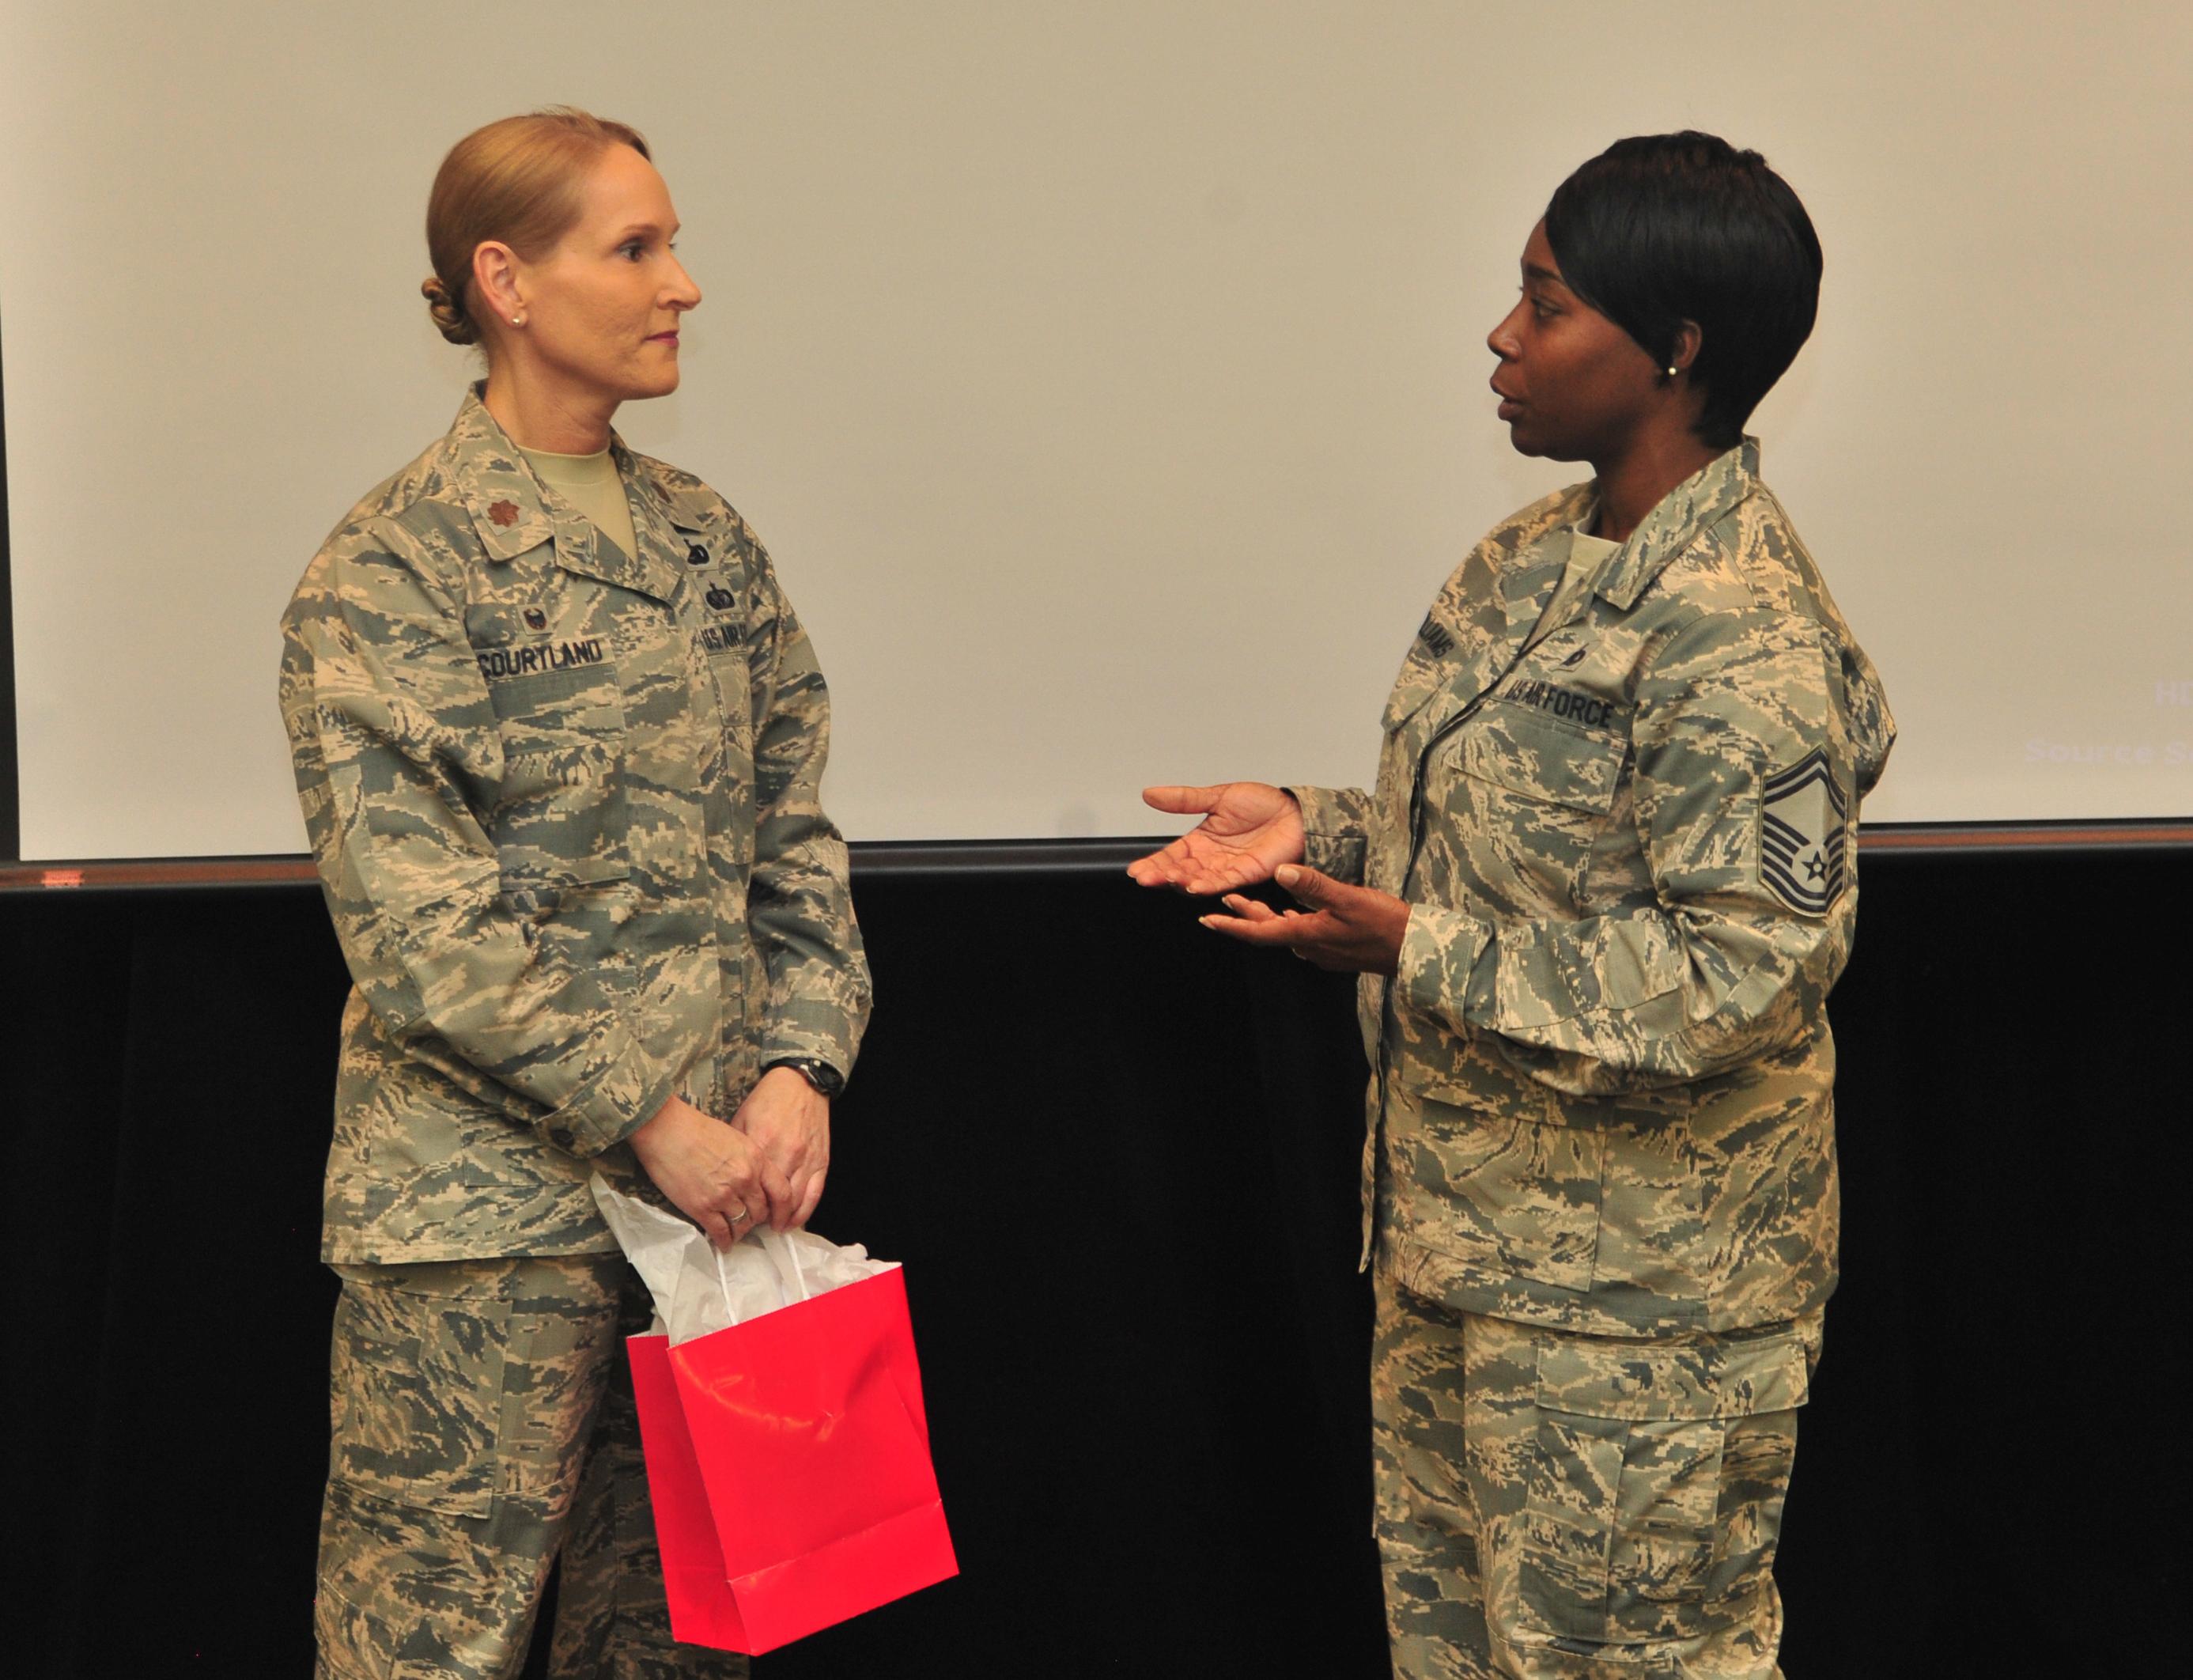 whiteman air force base milf women Explore whiteman air force base's 2,711 photos on flickr.